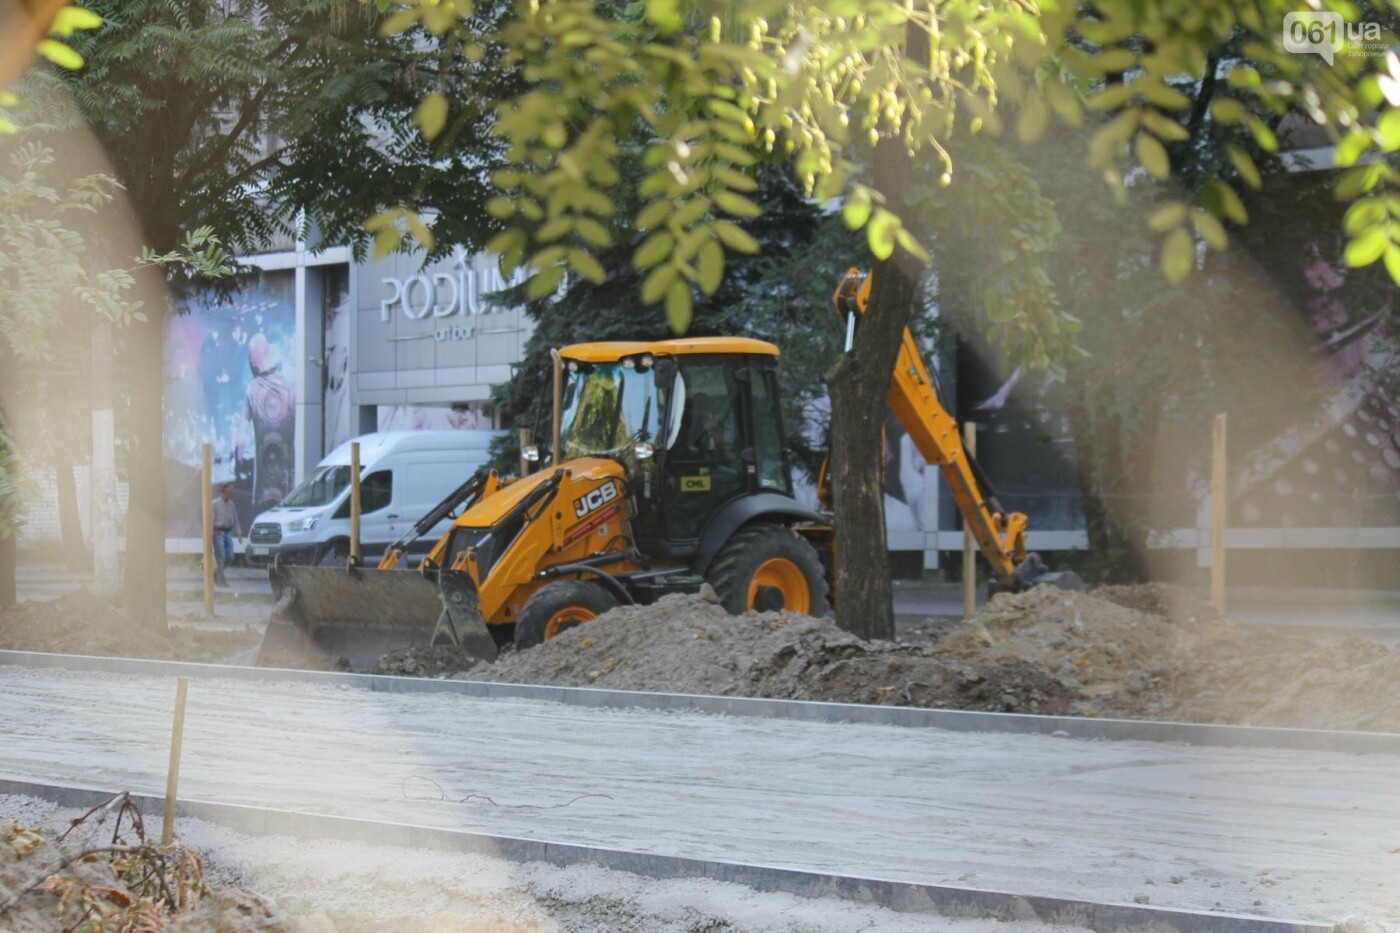 В Запорожье 900 метров дороги на Маяковского отремонтируют за 37 миллионов гривен, фото-2